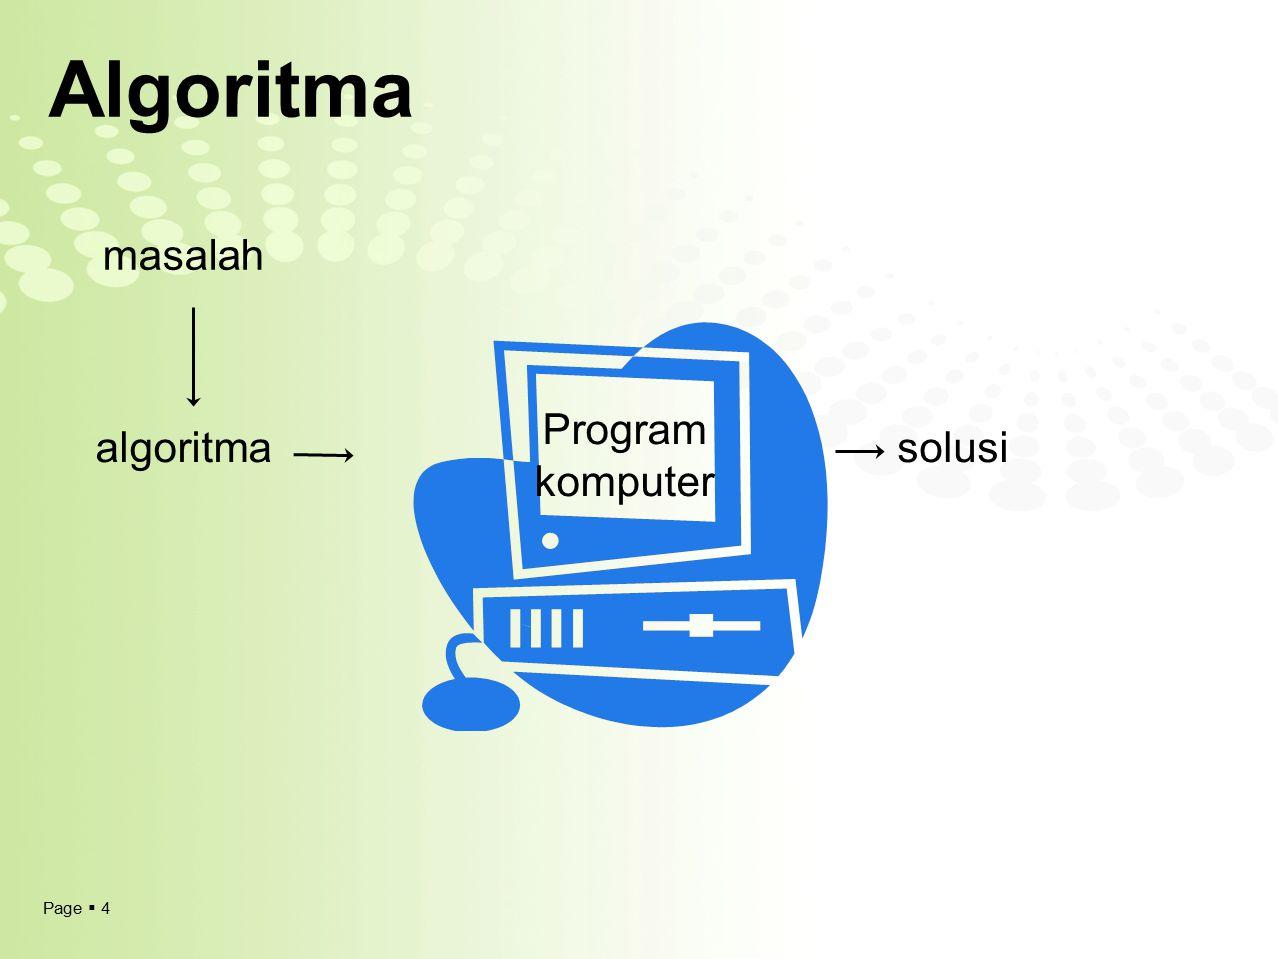 Page  5 Algoritma  Algorism  algorithm  nama penulis buku Arab yaitu Abu Ja'far Muhammad ibnu Musa Al-Khuwarizmi Algoritma adalah: 1)penyusunan aspek proses logika dari suatu pemecahan masalah tanpa melihat karakteristik bahasa pemrograman yang akan digunakan 2)urutan notasi logika yang merupakan hasil analisis dan rancangan sistematik dari strategi pemecahan masalah, untuk menggambarkan urutan langkah kerja yang jika dikerjakan akan membawa ke tujuannya.